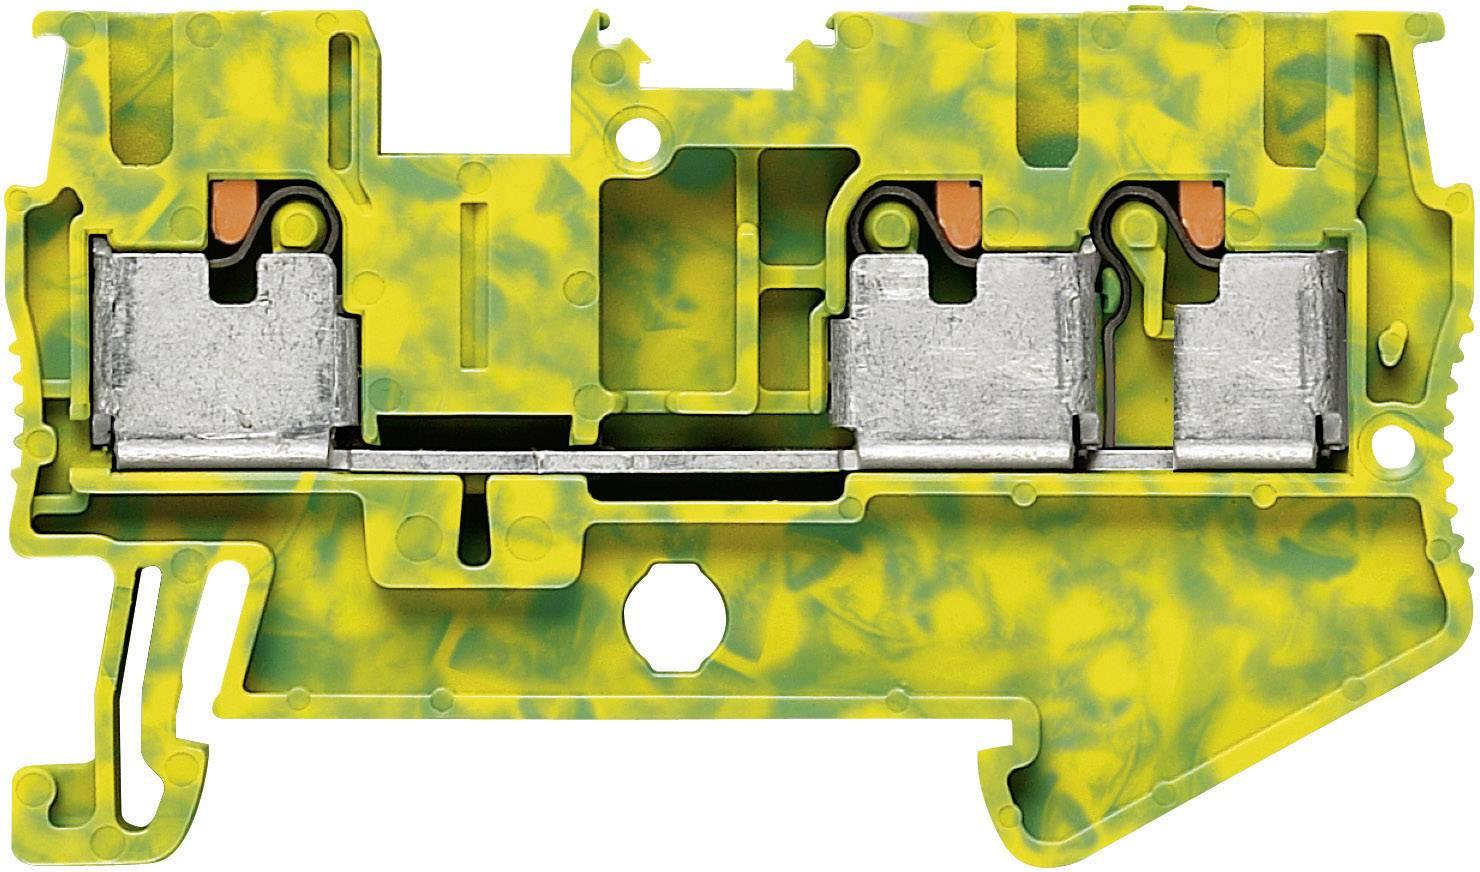 Svorka Push-in Phoenix Contact PIT 2,5-TWIN-PE (3209565), s ochr. vodičem, 5,2 mm, zel/žlut